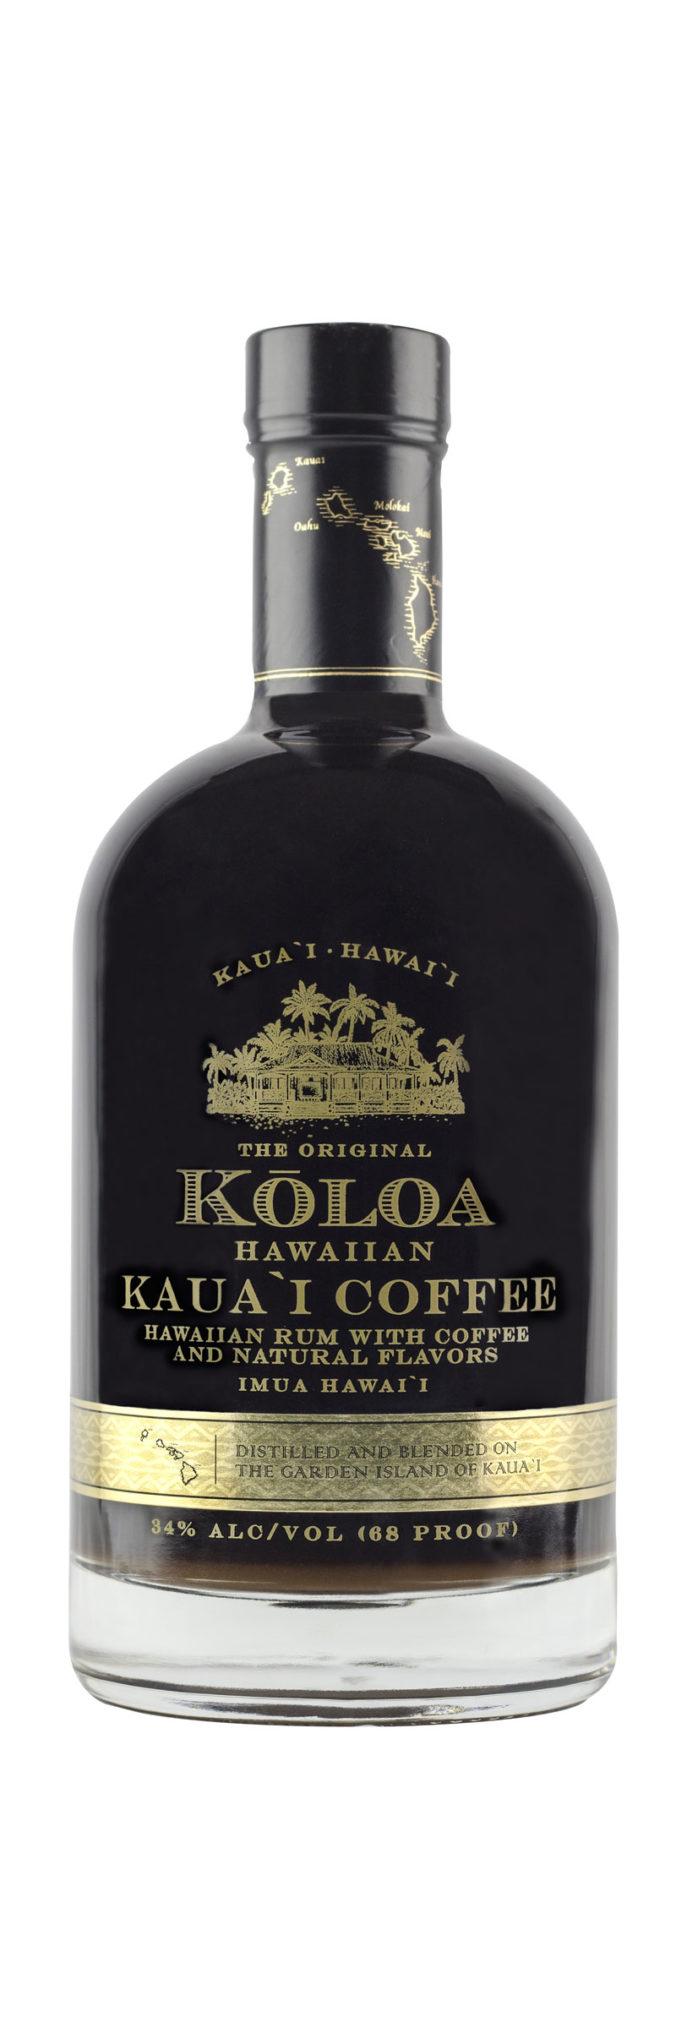 Koloa Hawaiian Kauai Coffee flavored rum